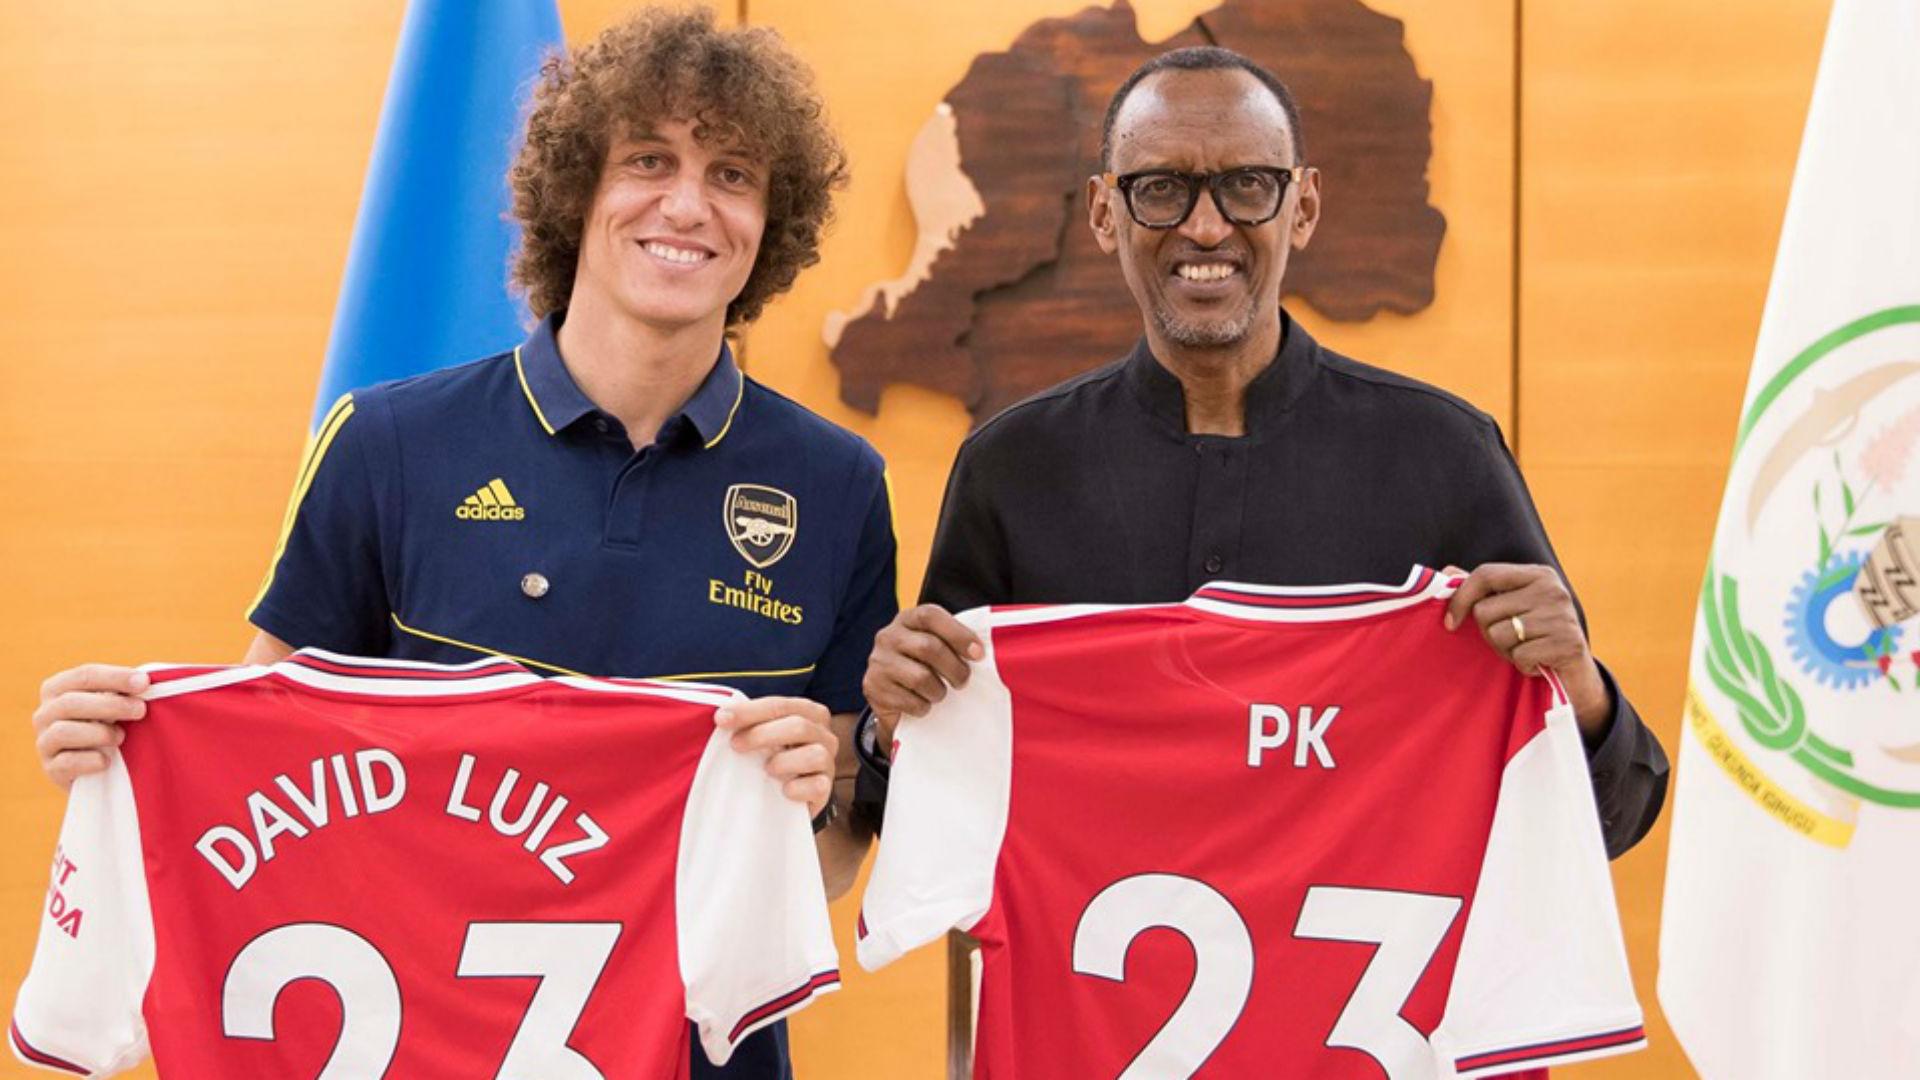 Rwanda President Kagame meets Arsenal defender David Luiz and Didier Drogba